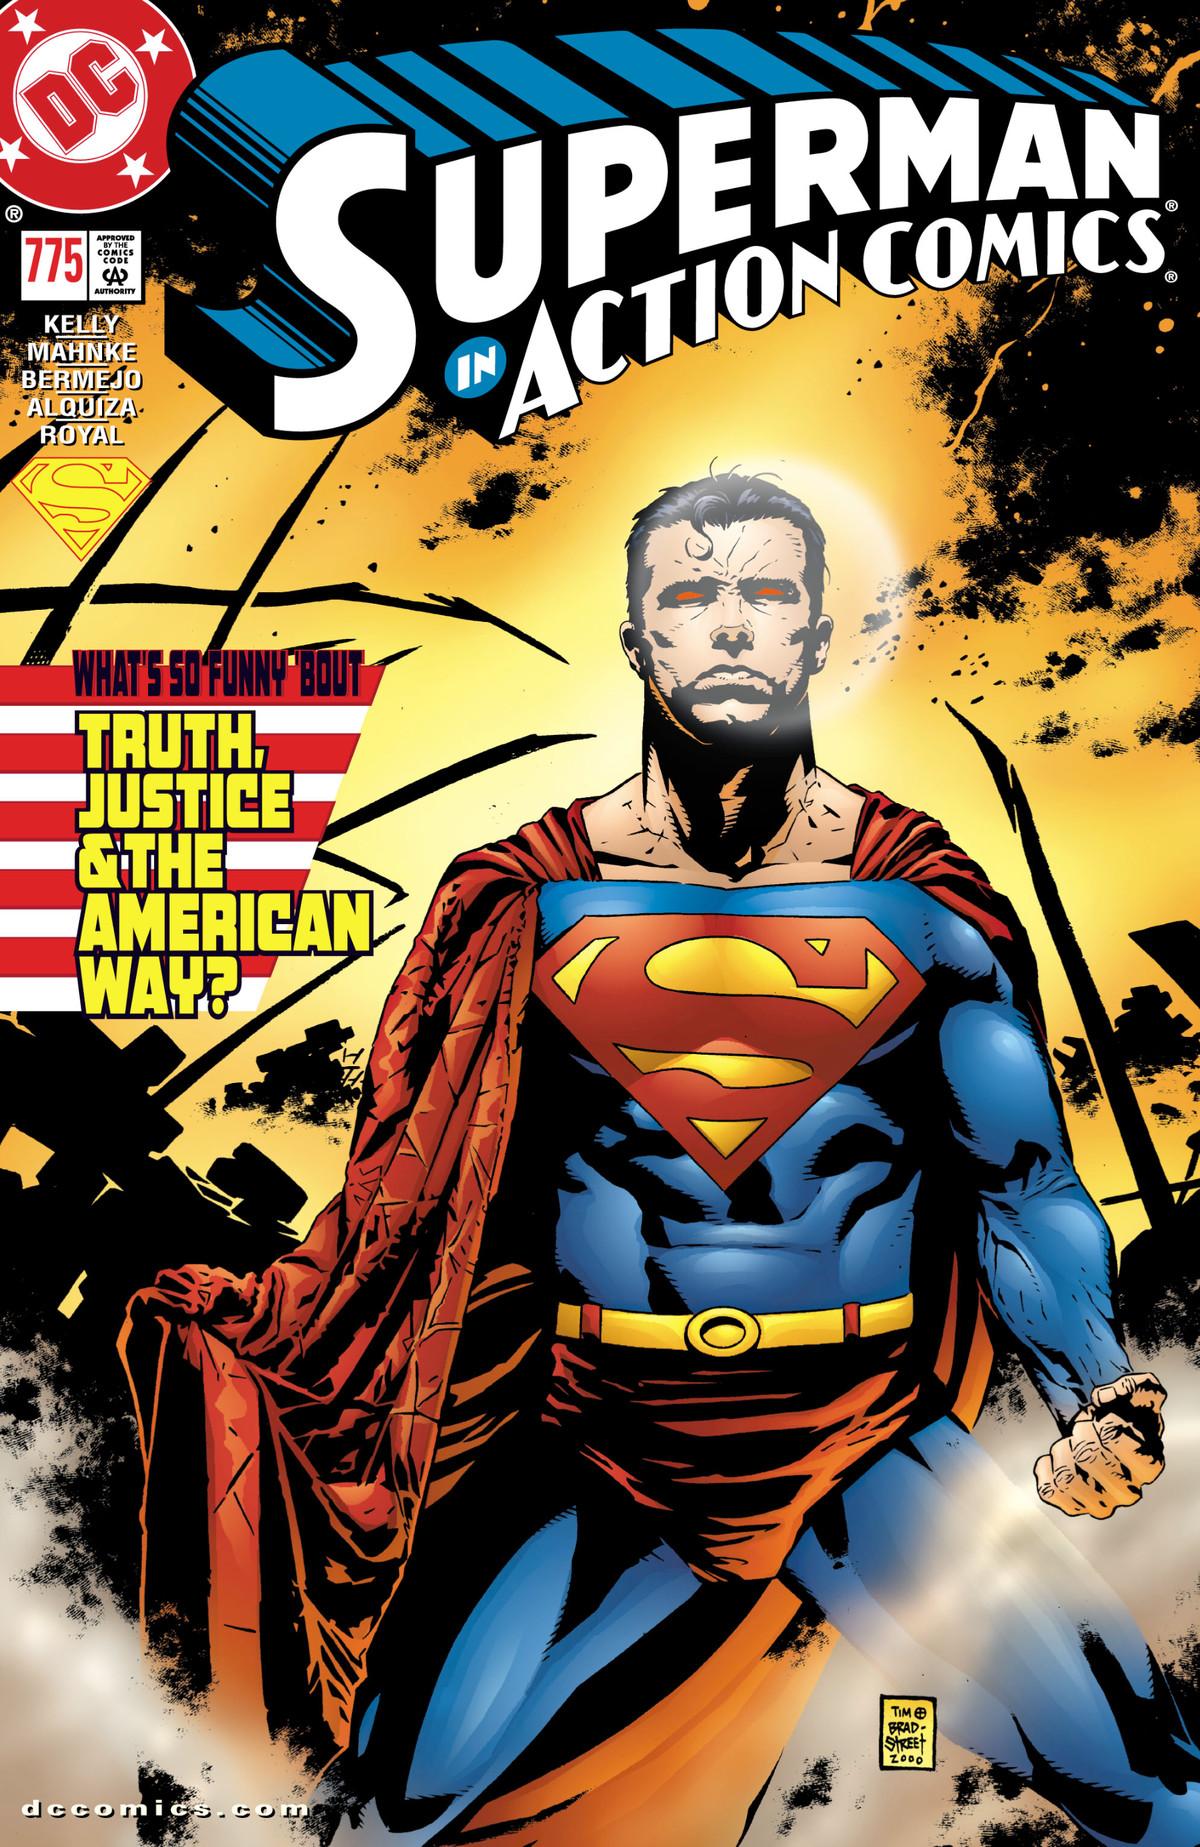 Superman kneels amidst firey destruction on the cover of Action Comics #775, DC Comics (2001).